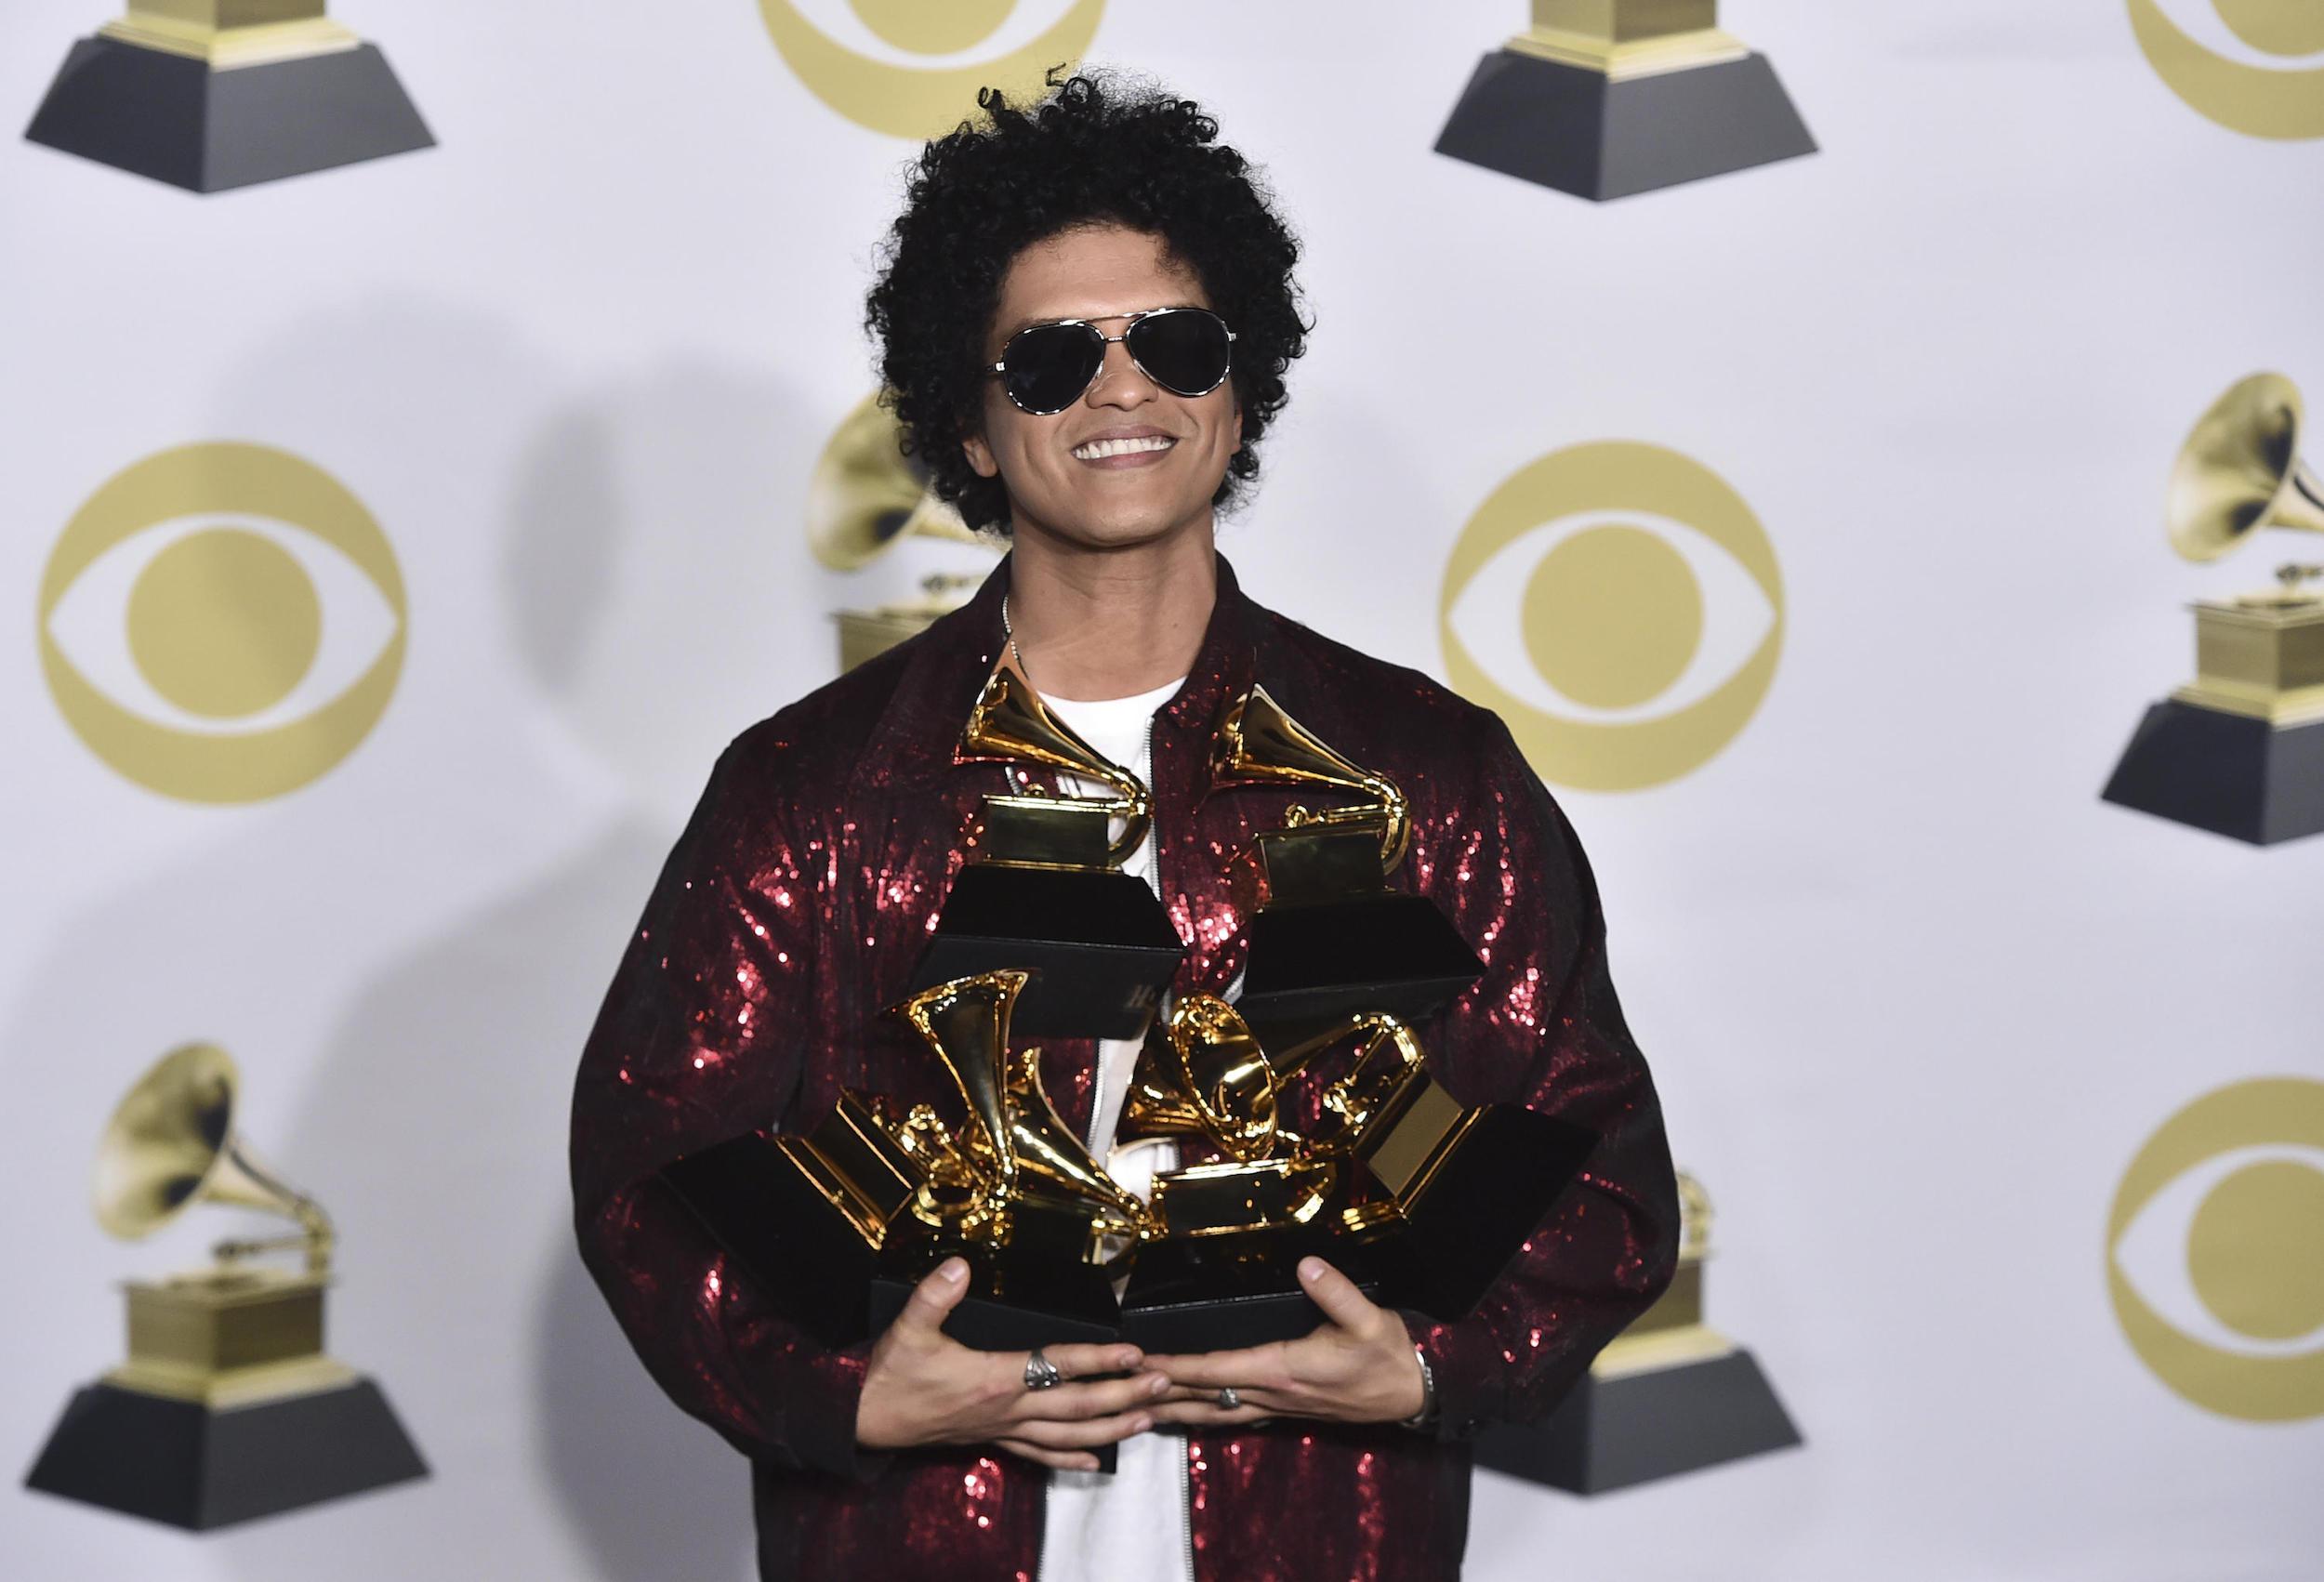 O Hexa De Bruno Mars